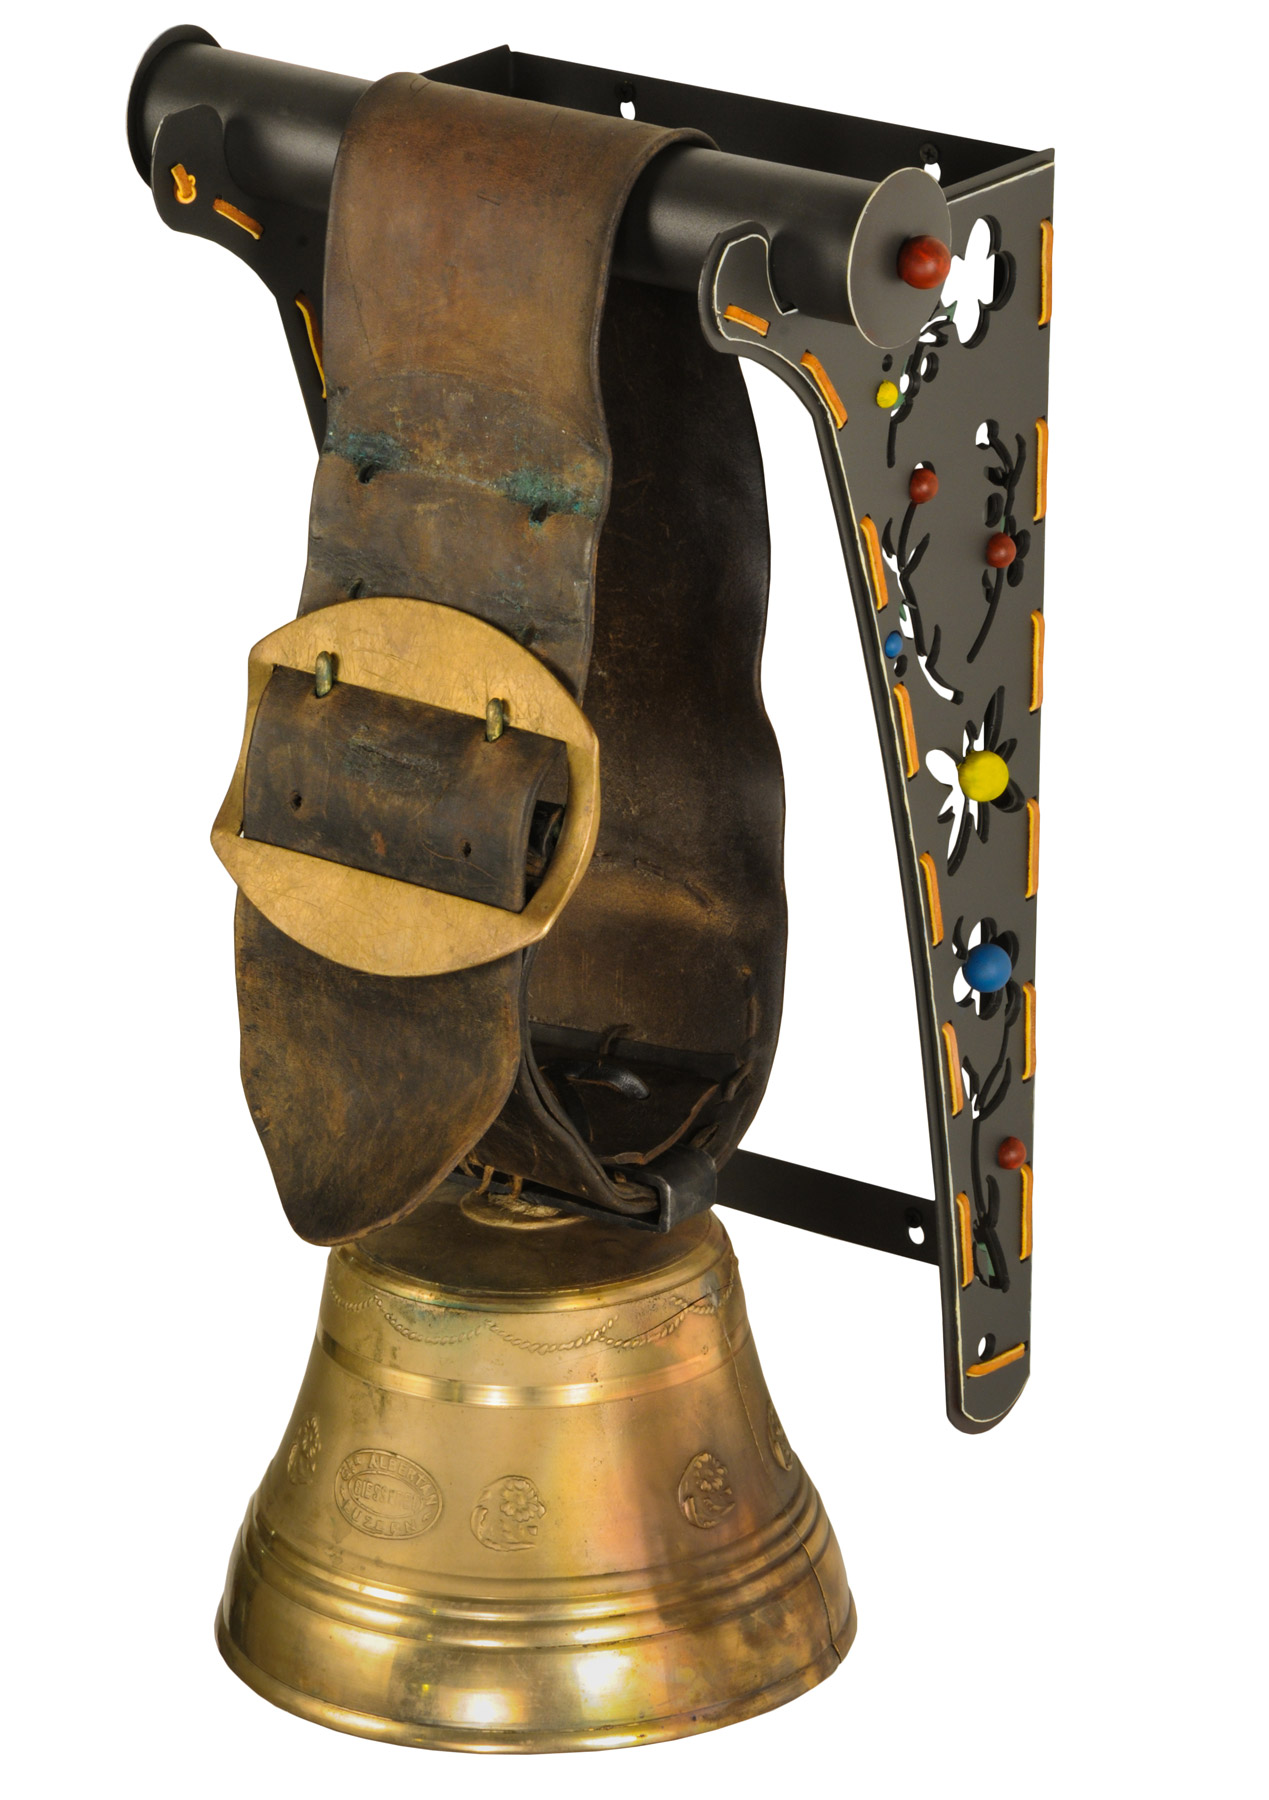 Meyda 150519 Swiss Cow Bell Decorative Wall Bracket